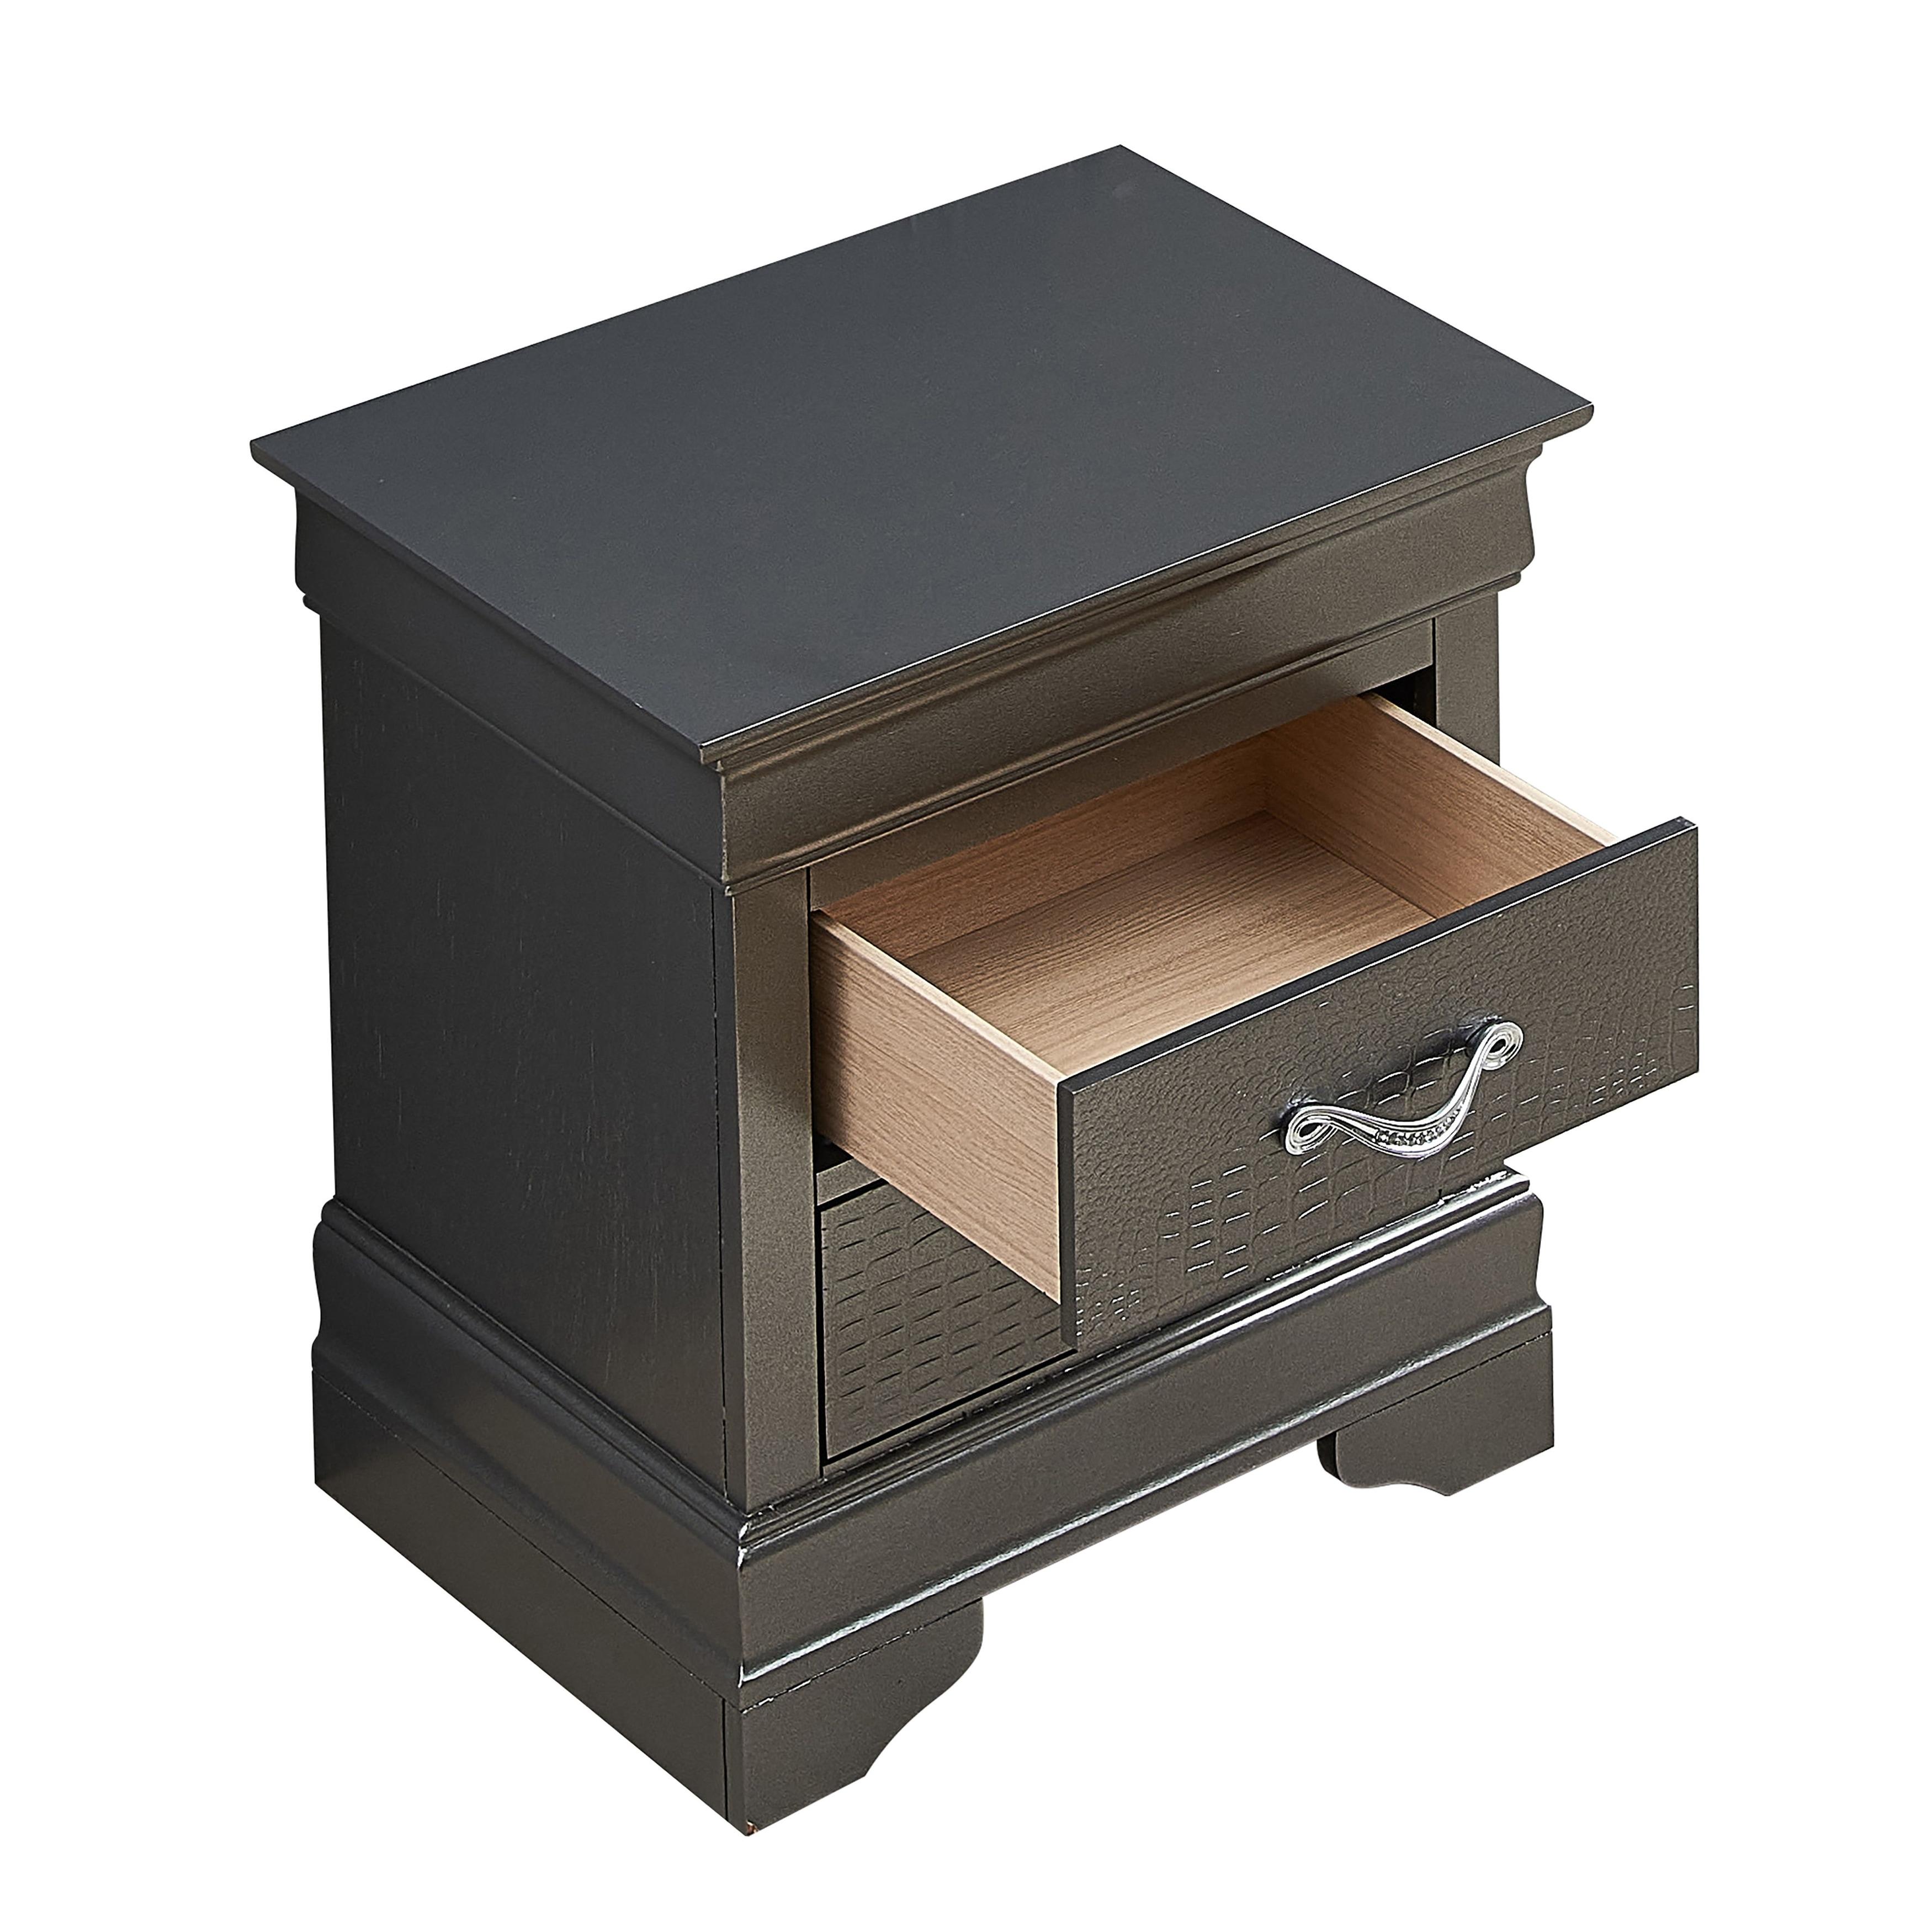 Lorana 2 Drawer Wooden Nightstand Overstock 20652427